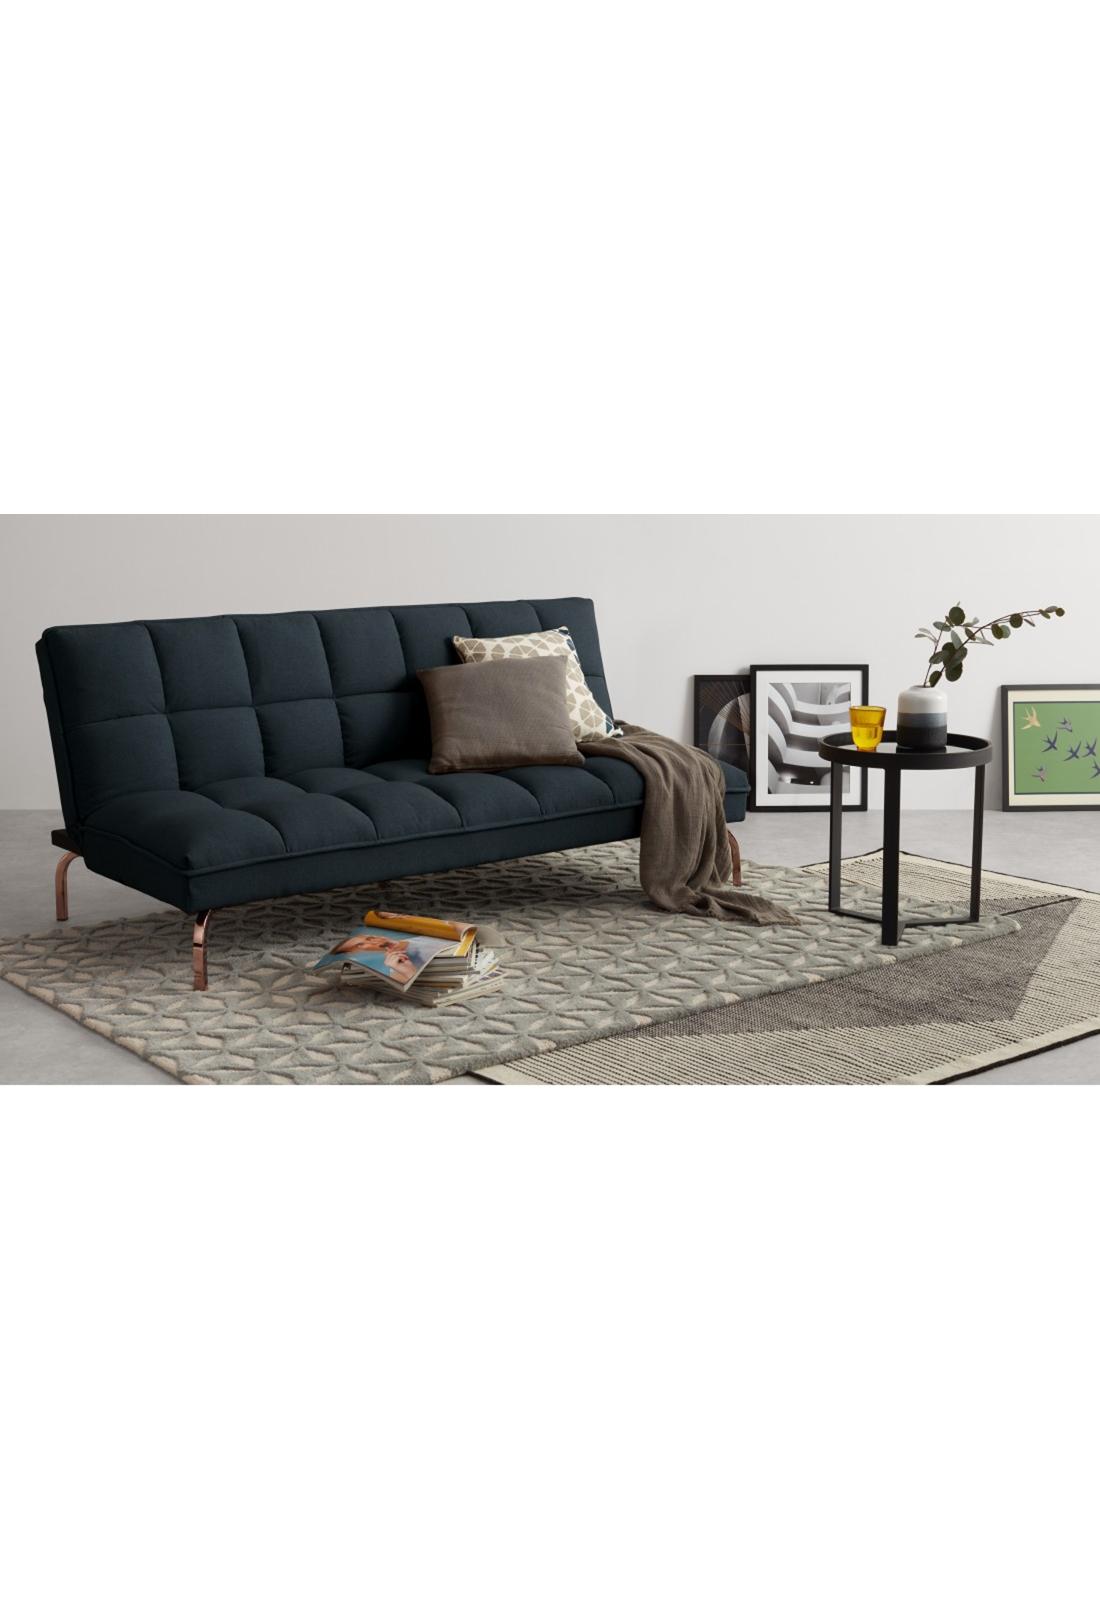 Hallie Click Clack Sofa Bed Aegean Blue With Copper Legs V 2020 G Mebel